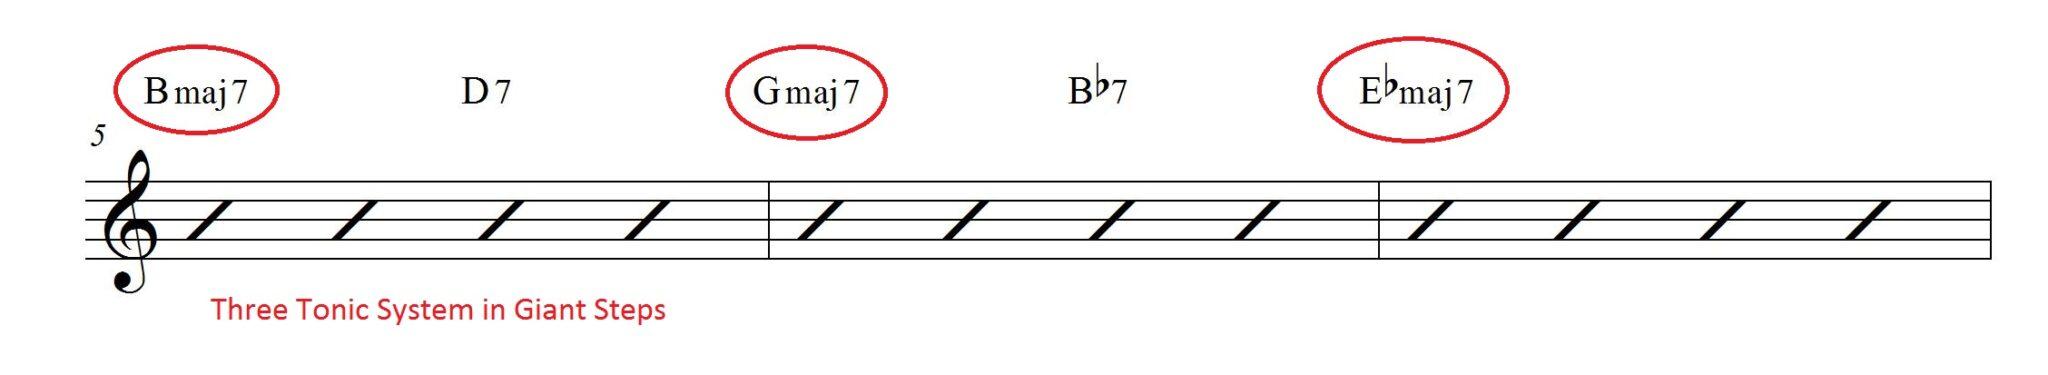 Coltrane Changes 1